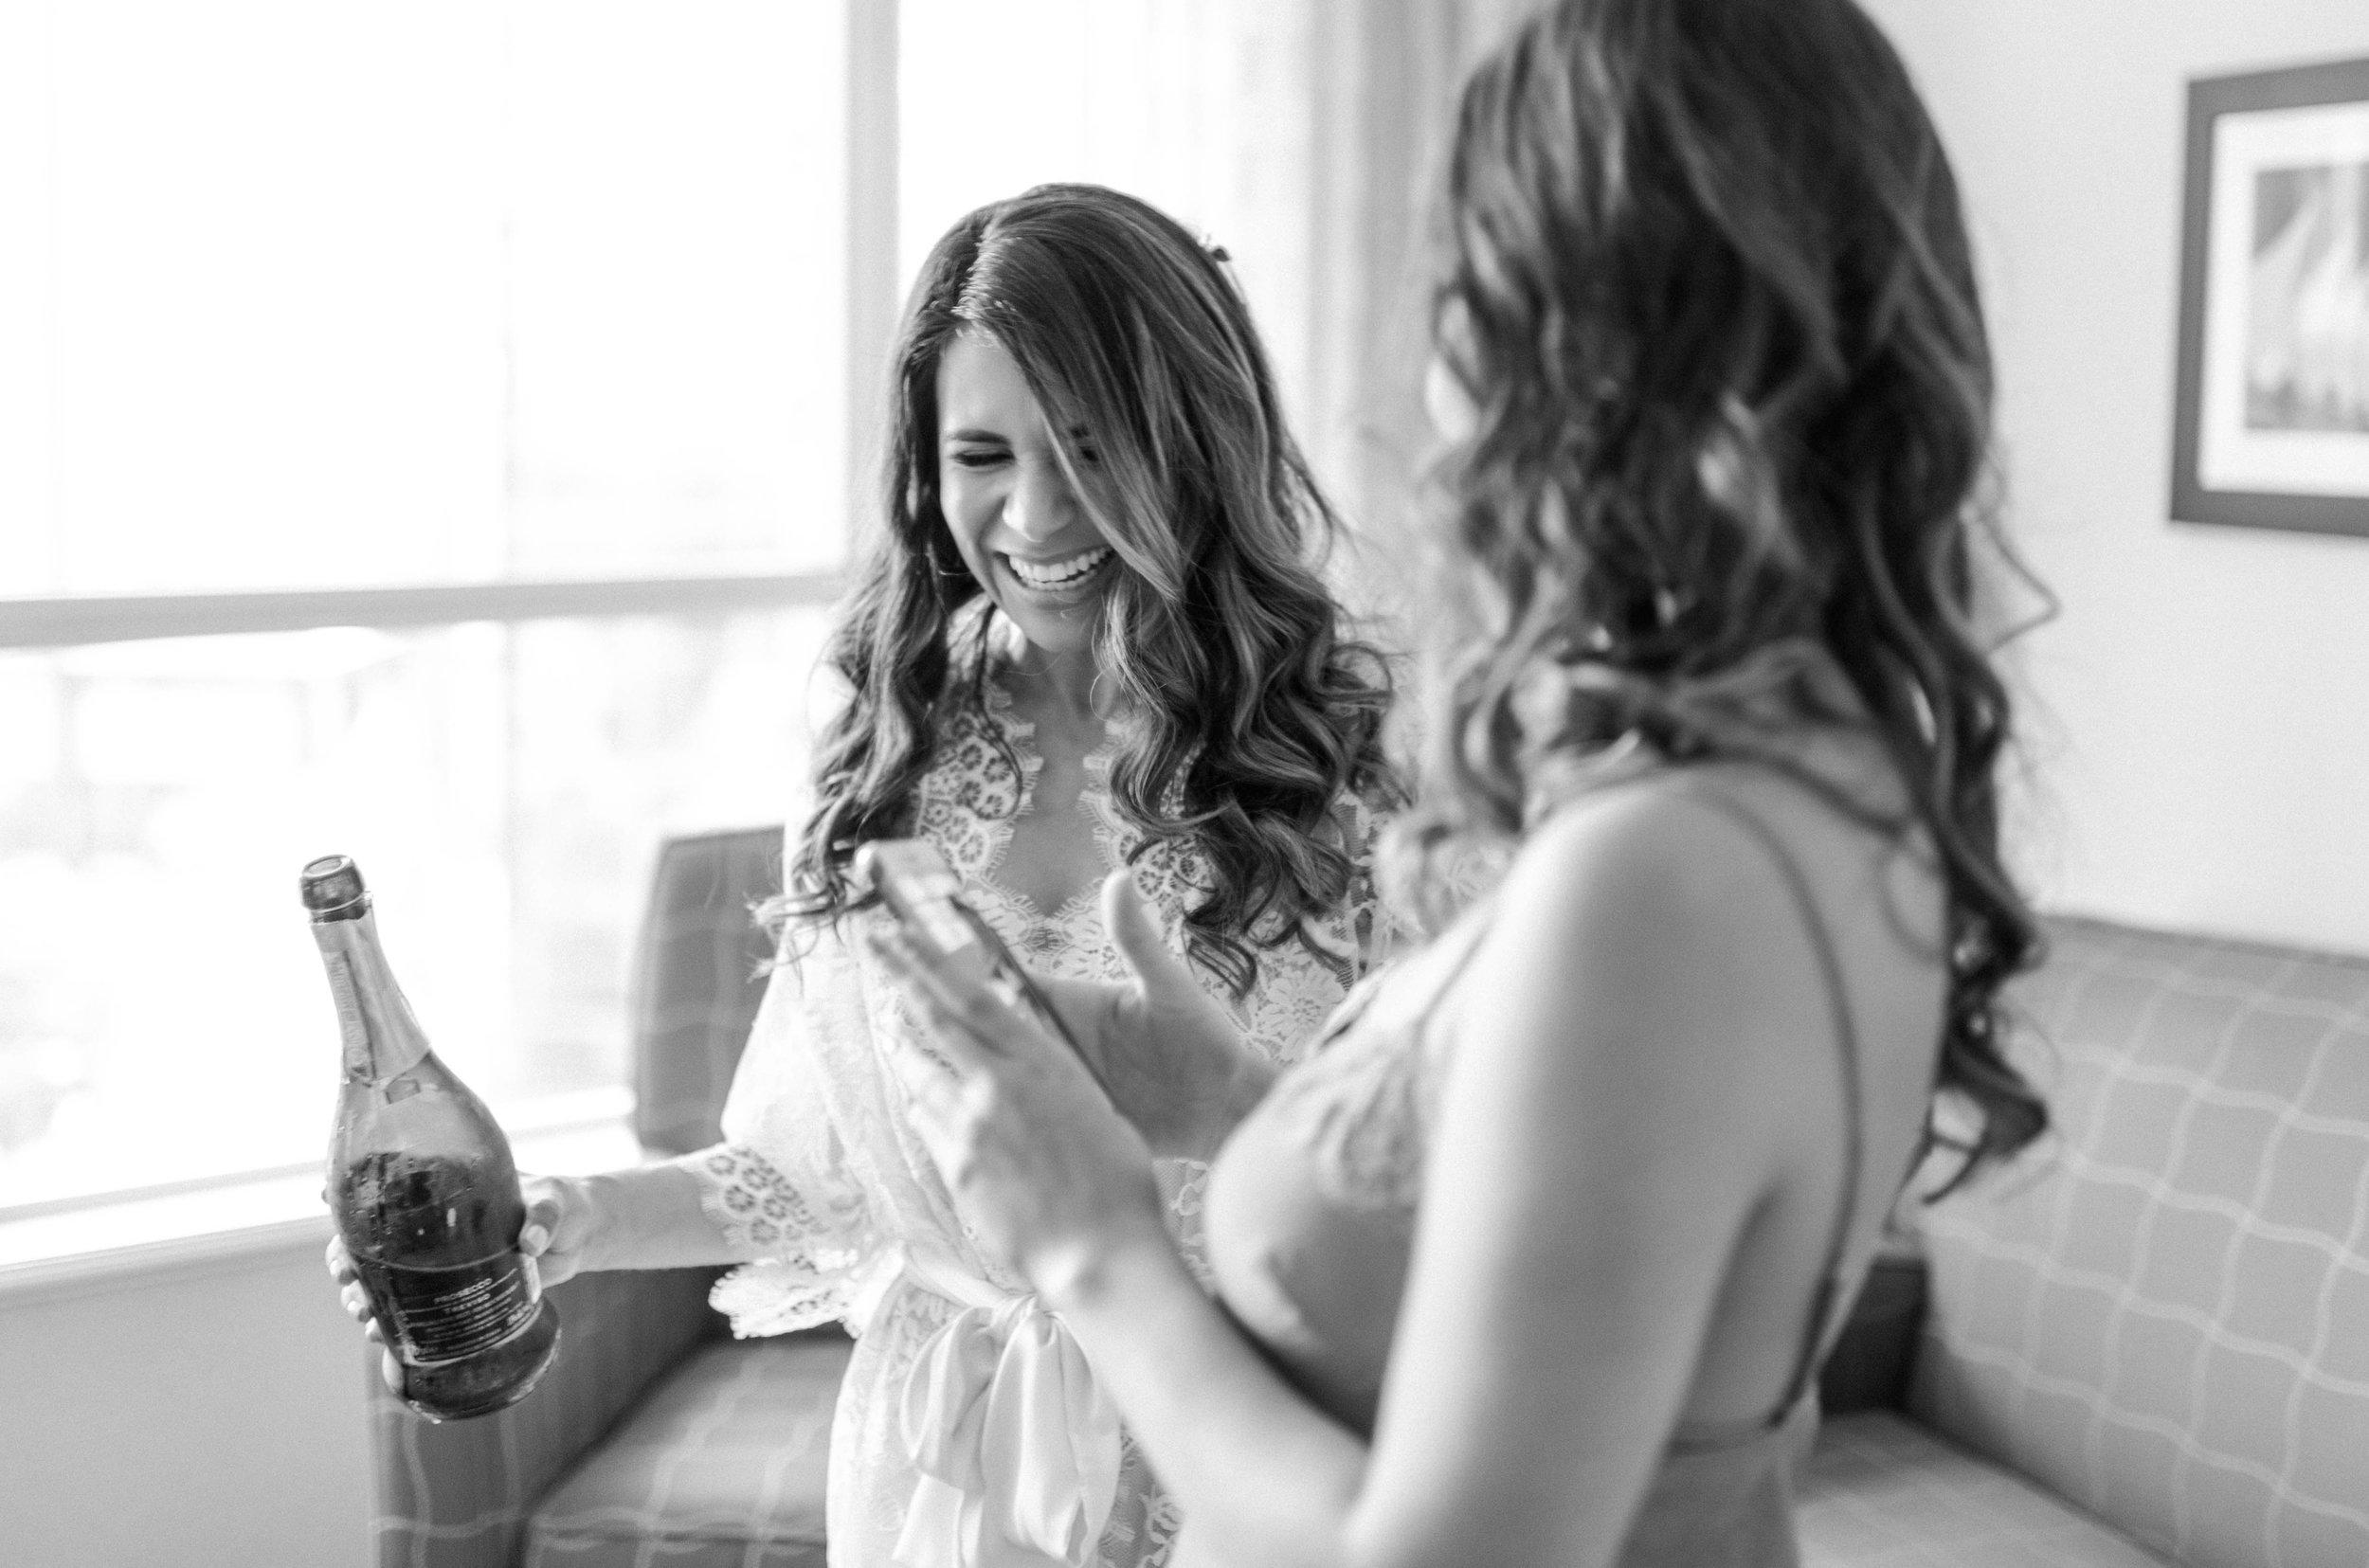 austin-texas-wedding-photography-1778-photographie-10.jpg